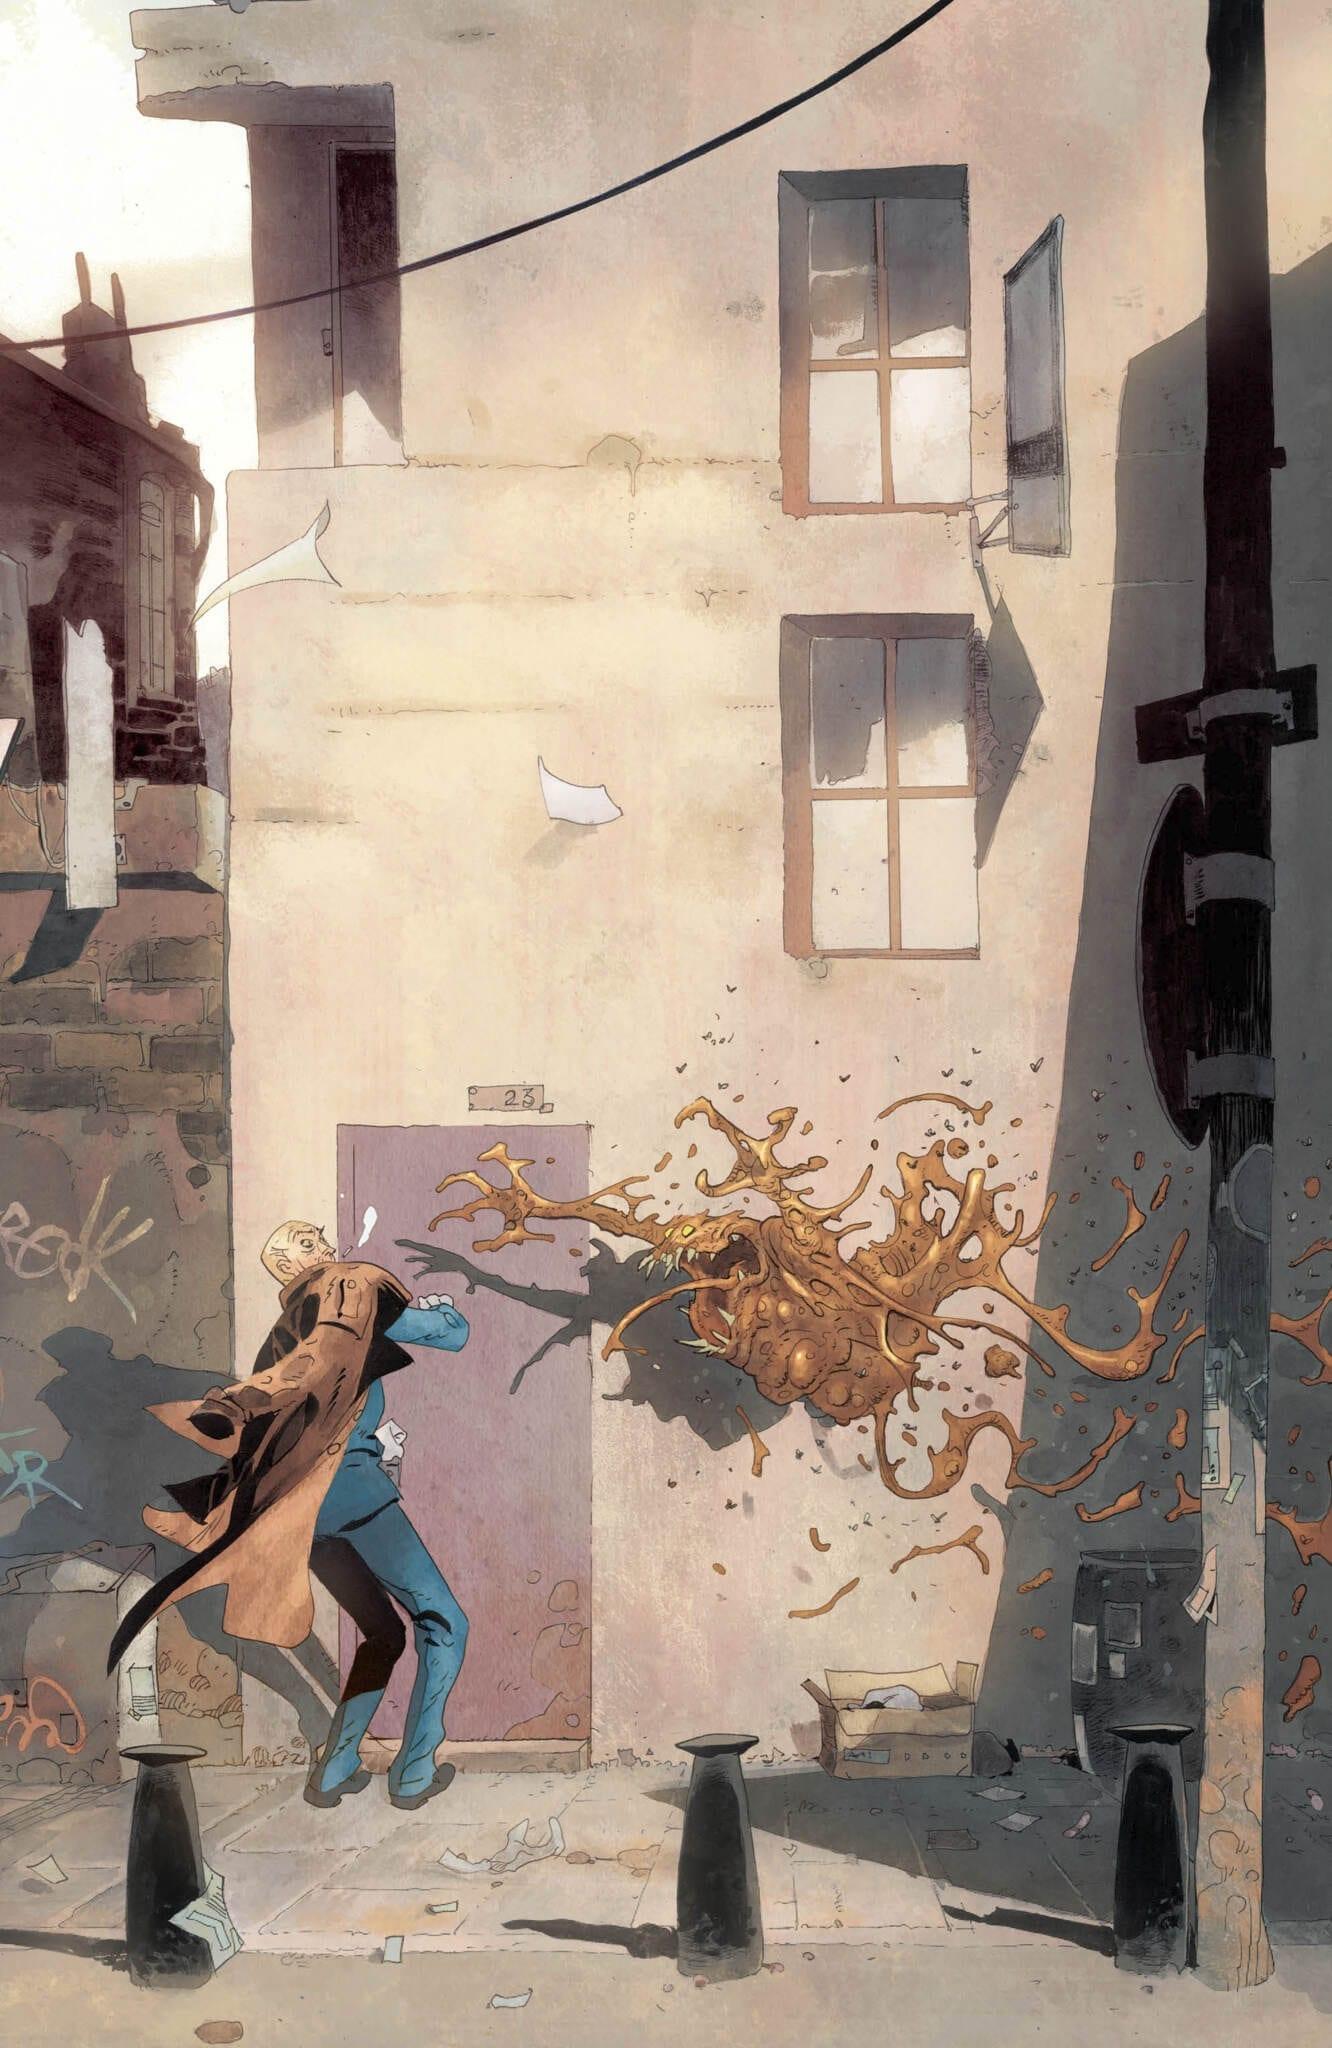 Hellblazer #4 even has turd monsters!